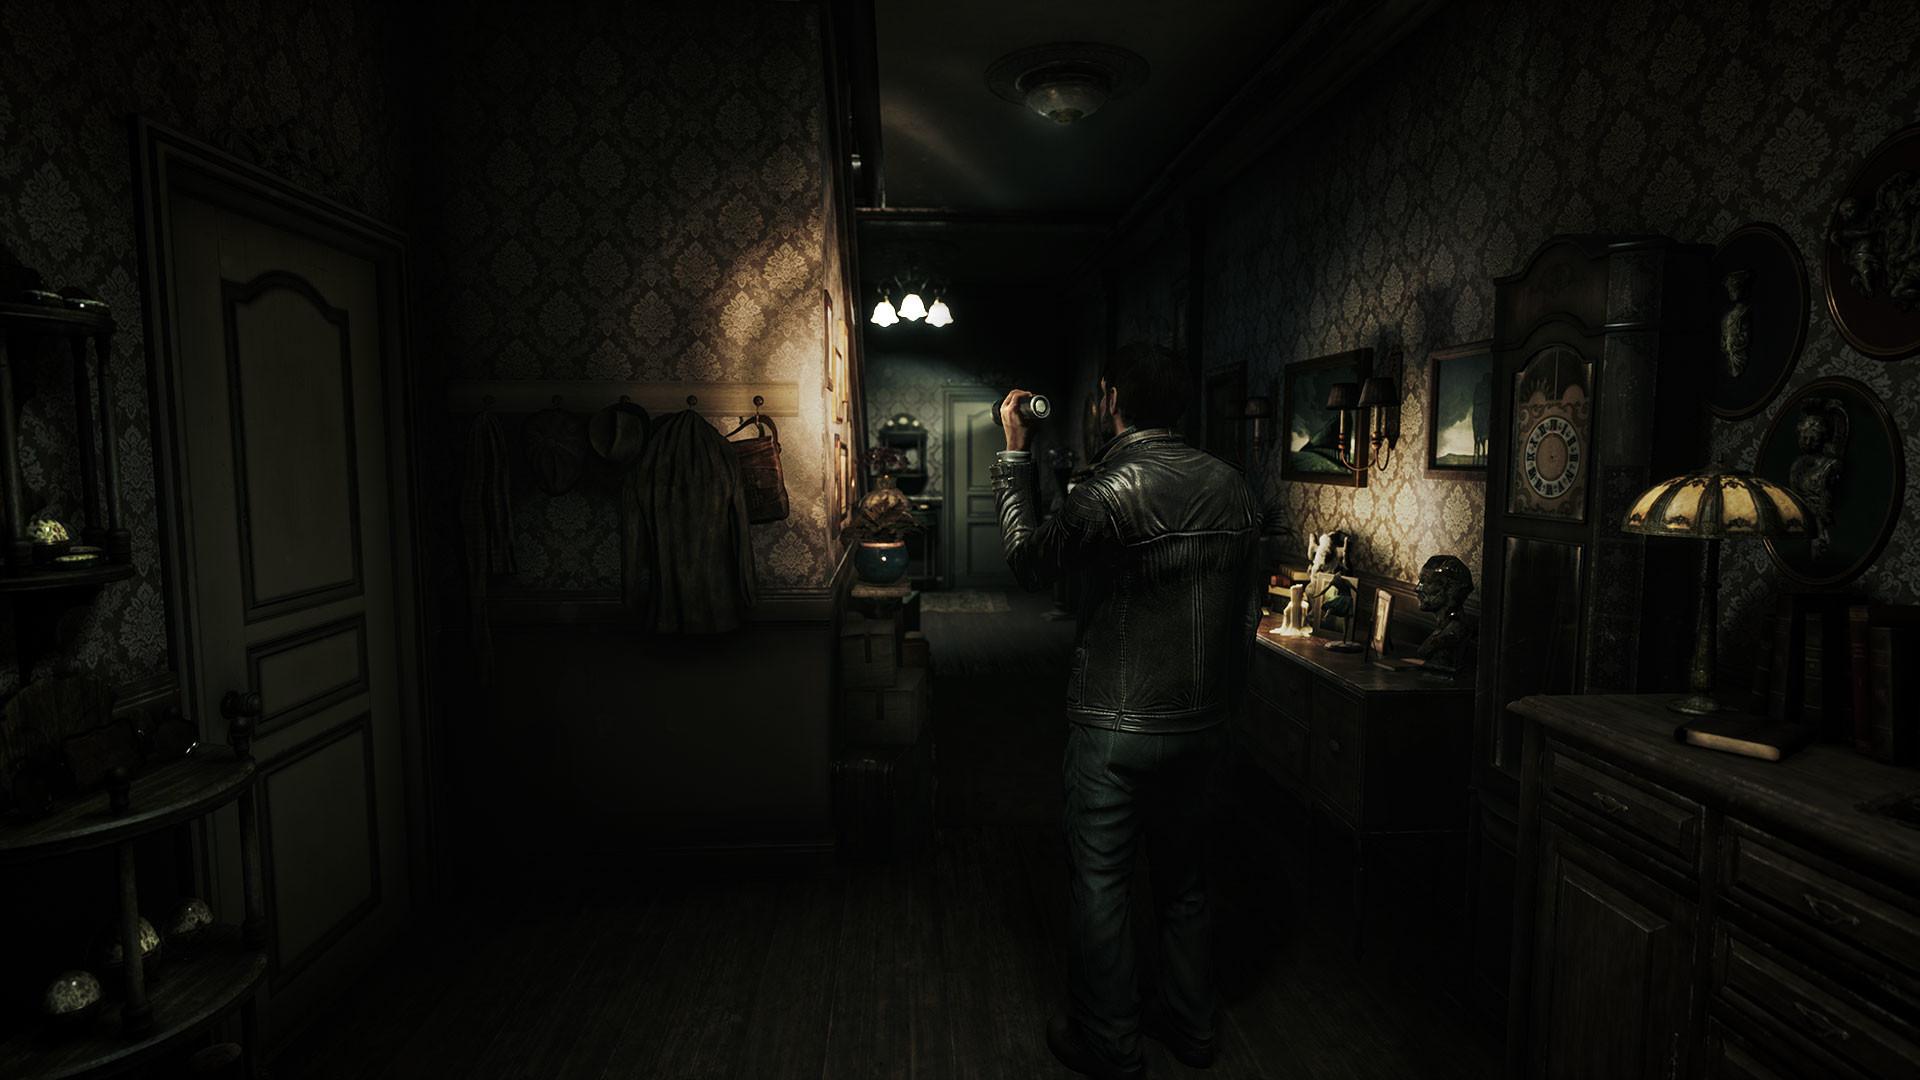 song of horror wallpaper 74493